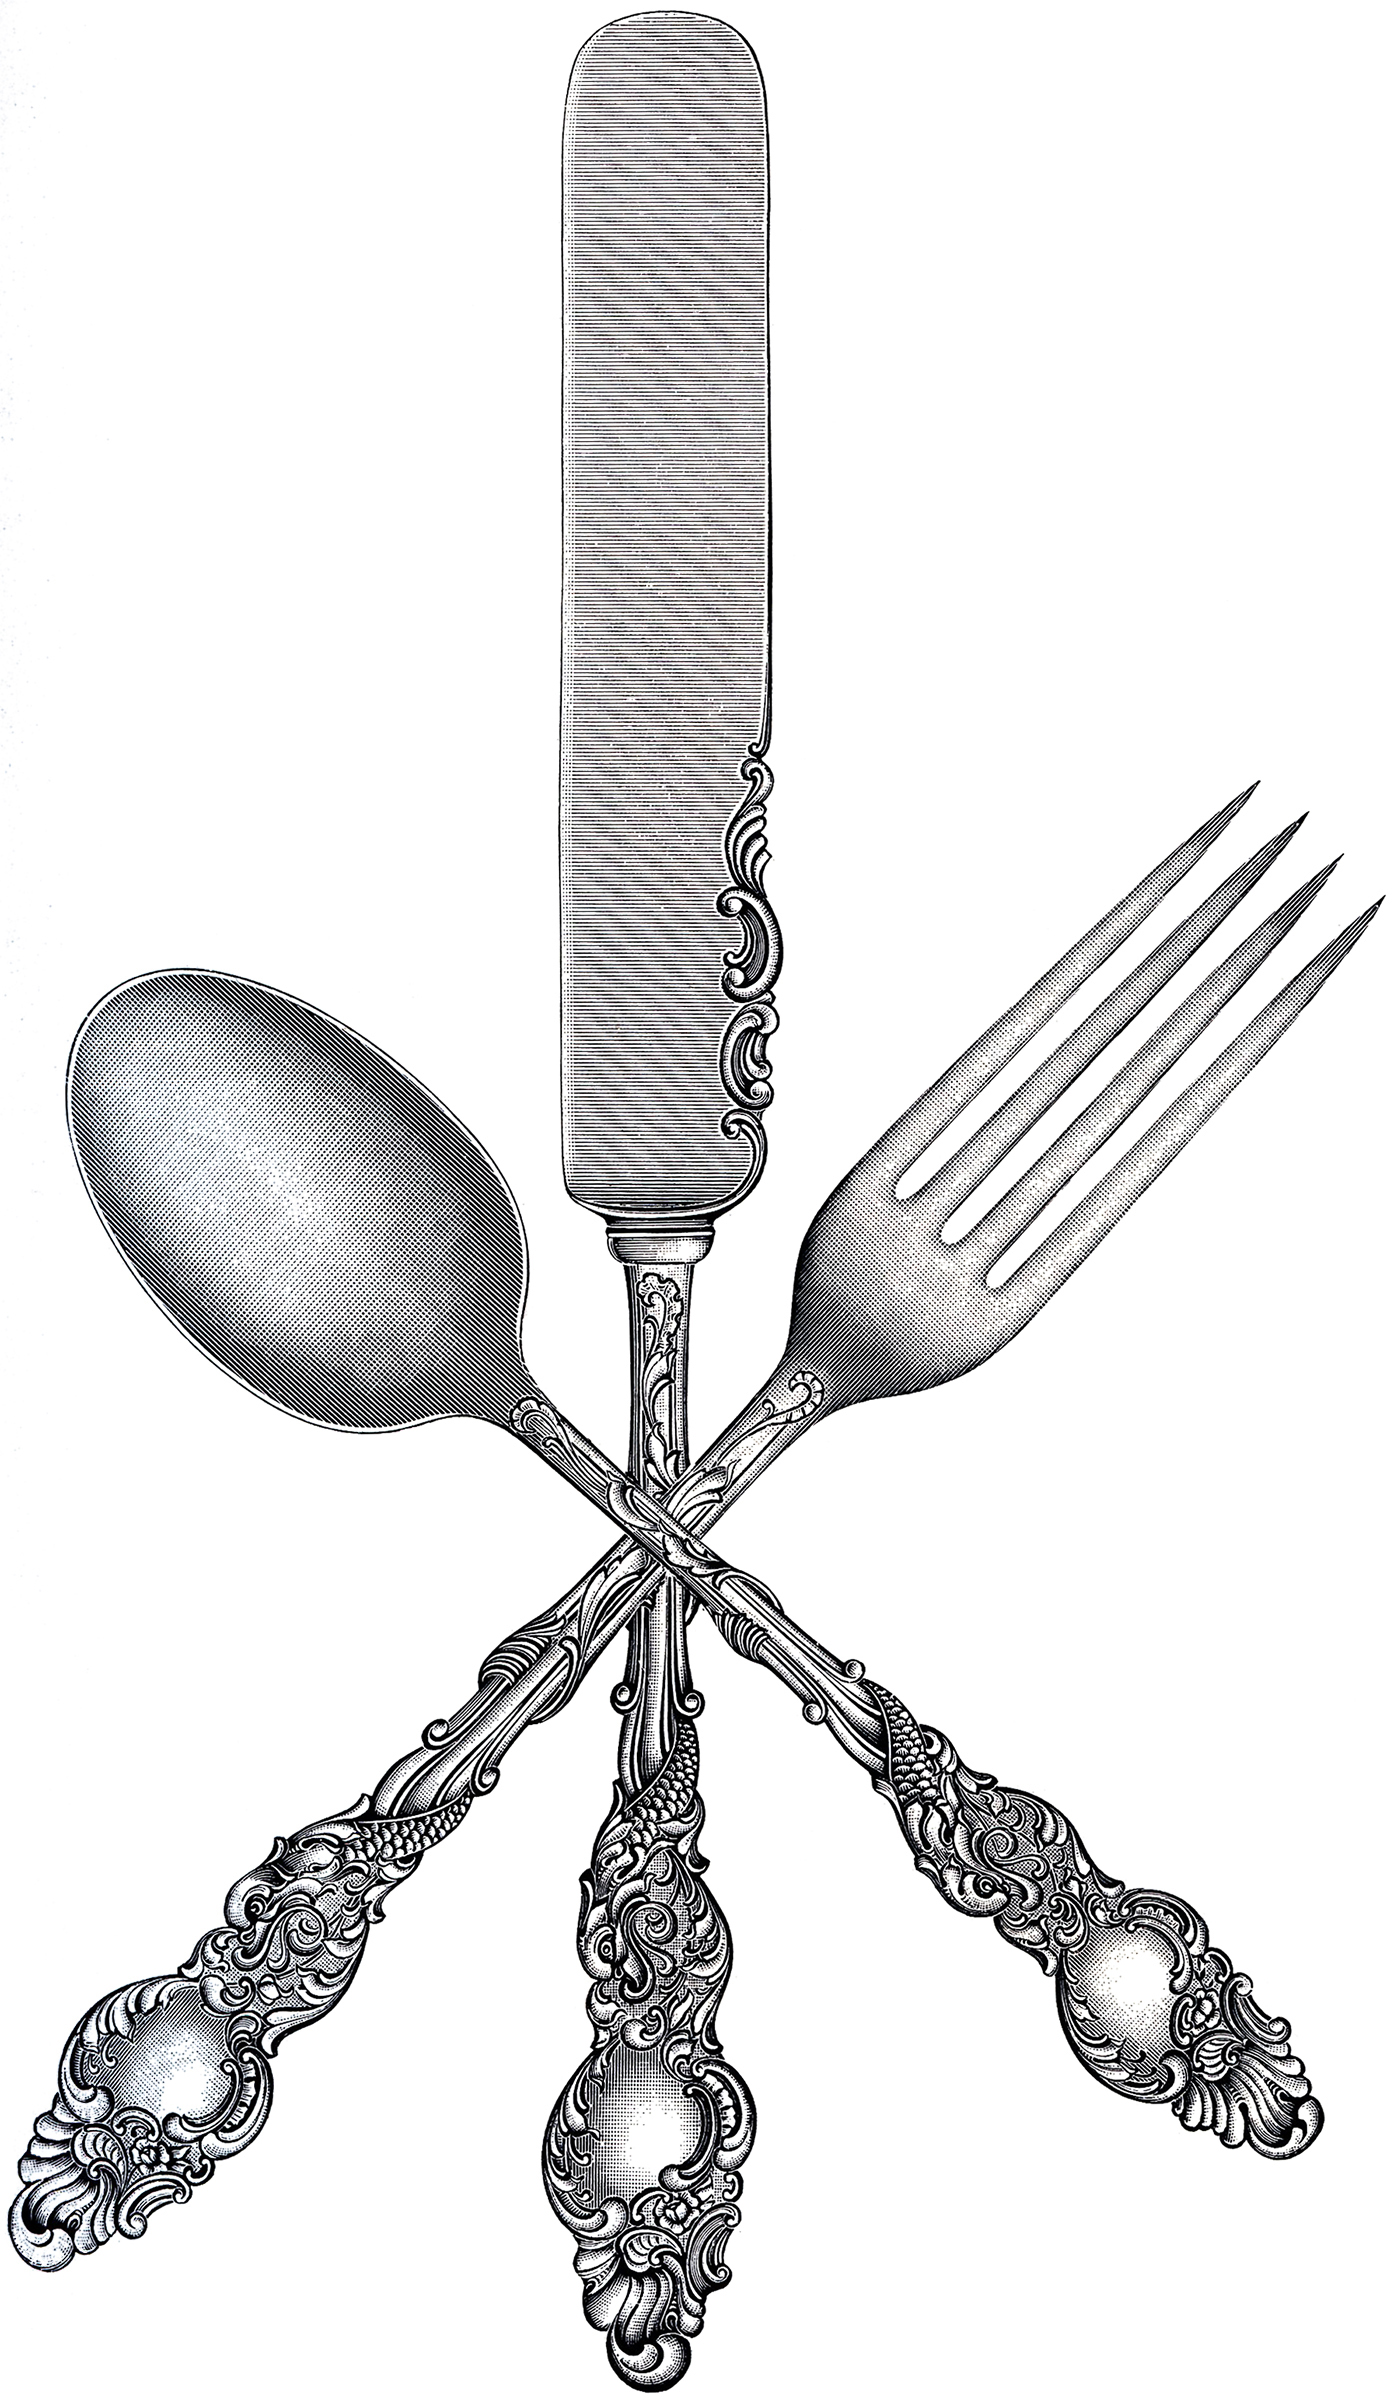 Khife clipart spoon Fork Fairy Knife Free Spoon